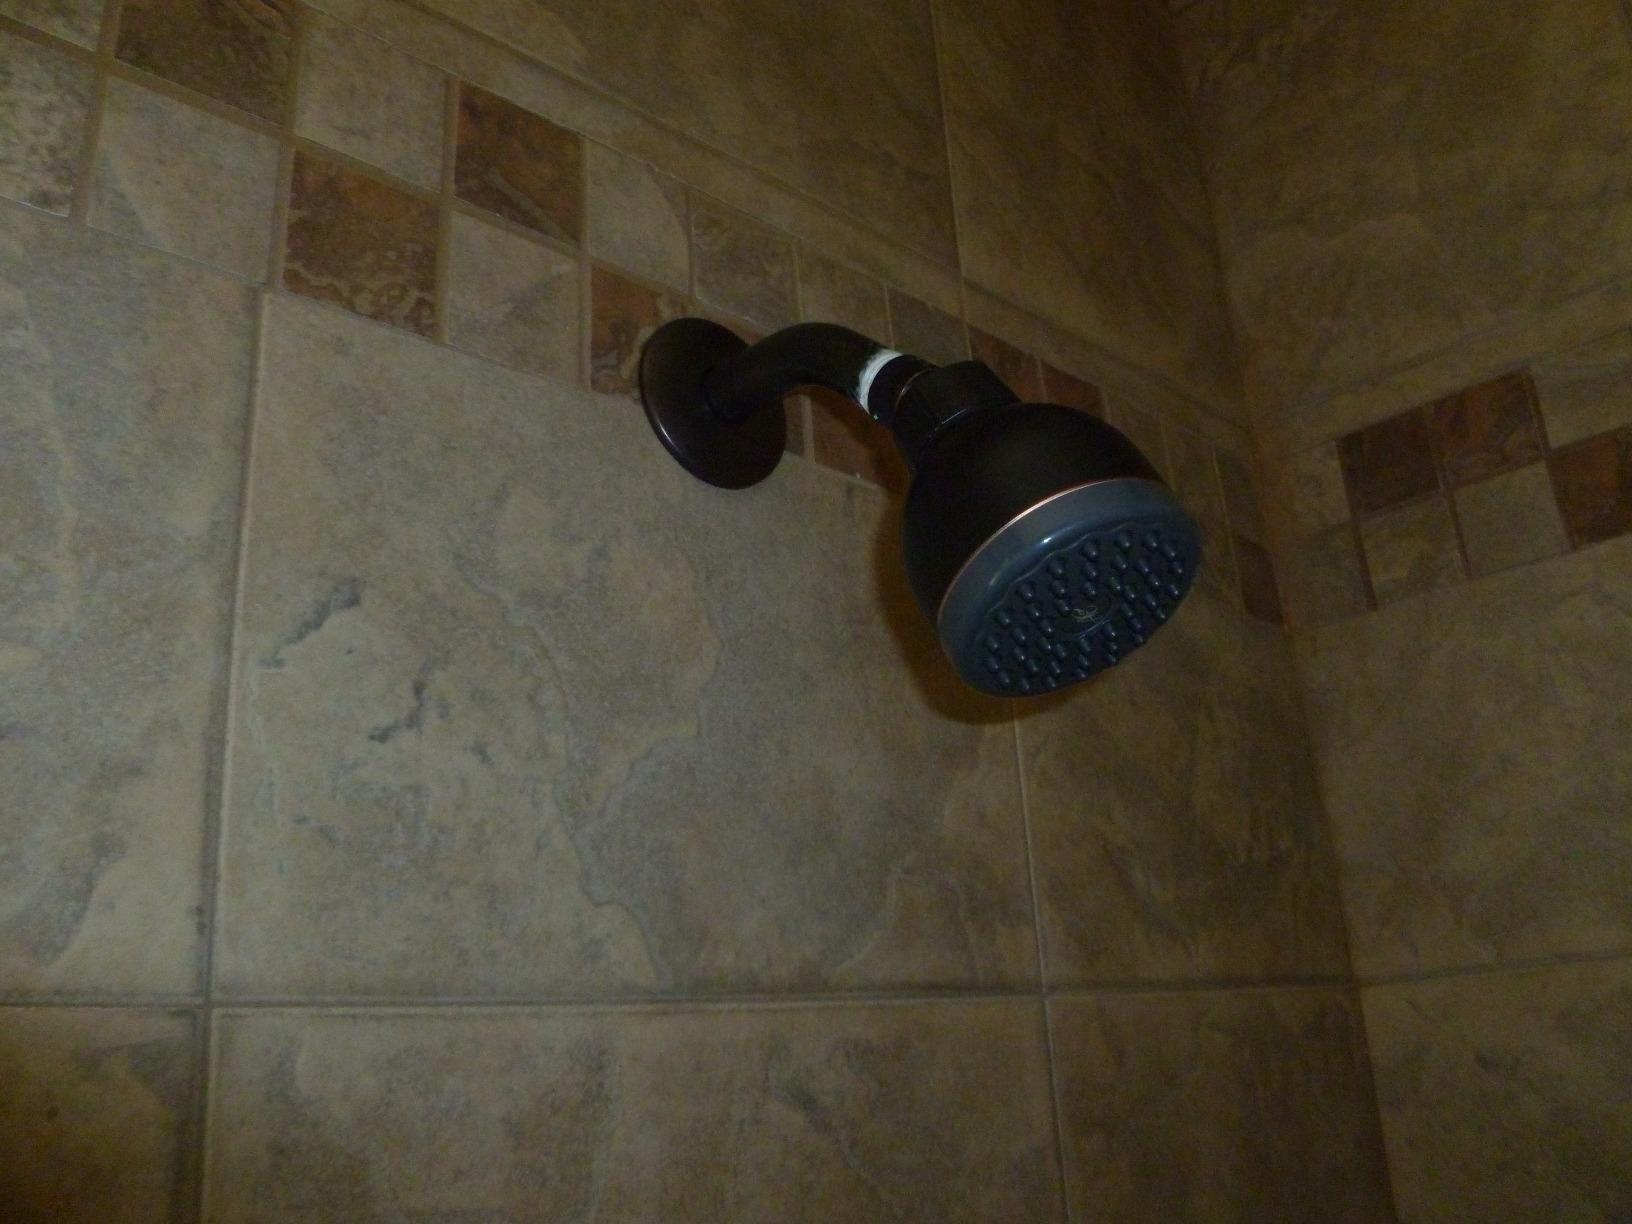 Best High Pressure Shower Head Reviews In 2020 High Pressure Shower Head Shower Head Reviews Shower Heads